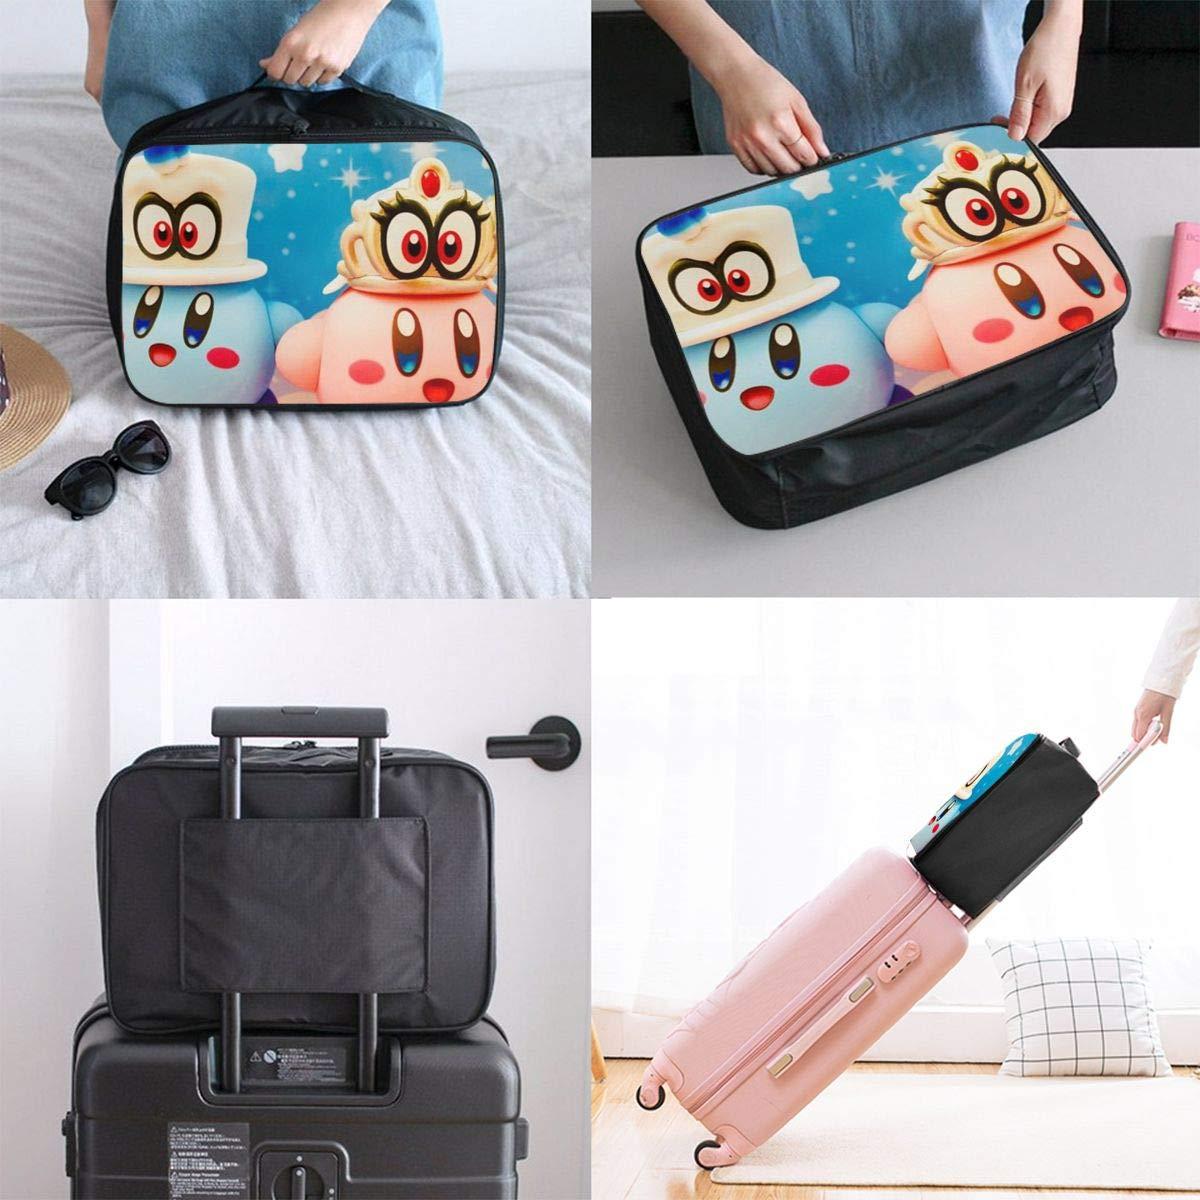 BOKAIKAI1306 Abstract K-Kirby Unisex Adult Fashion Lightweight Large Capacity Portable Large Travel Duffel Bag Mens Womens Luggage Bag 3D Printing DIY Boarding Box